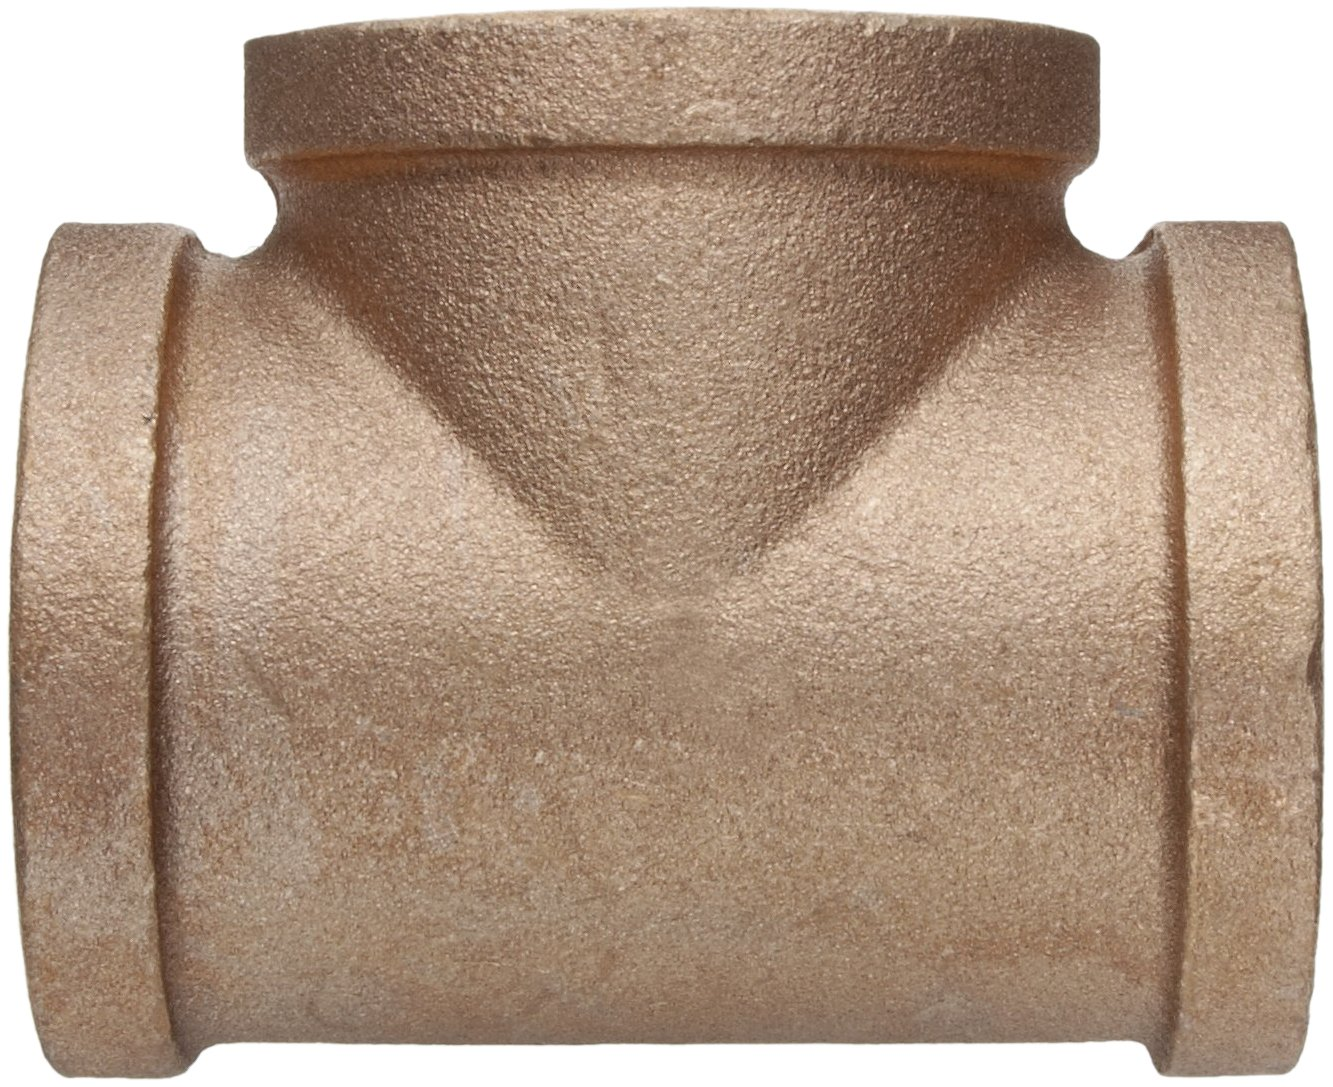 Class 125 Lead Free Brass Pipe Fitting 1-1//4 NPT Female Tee